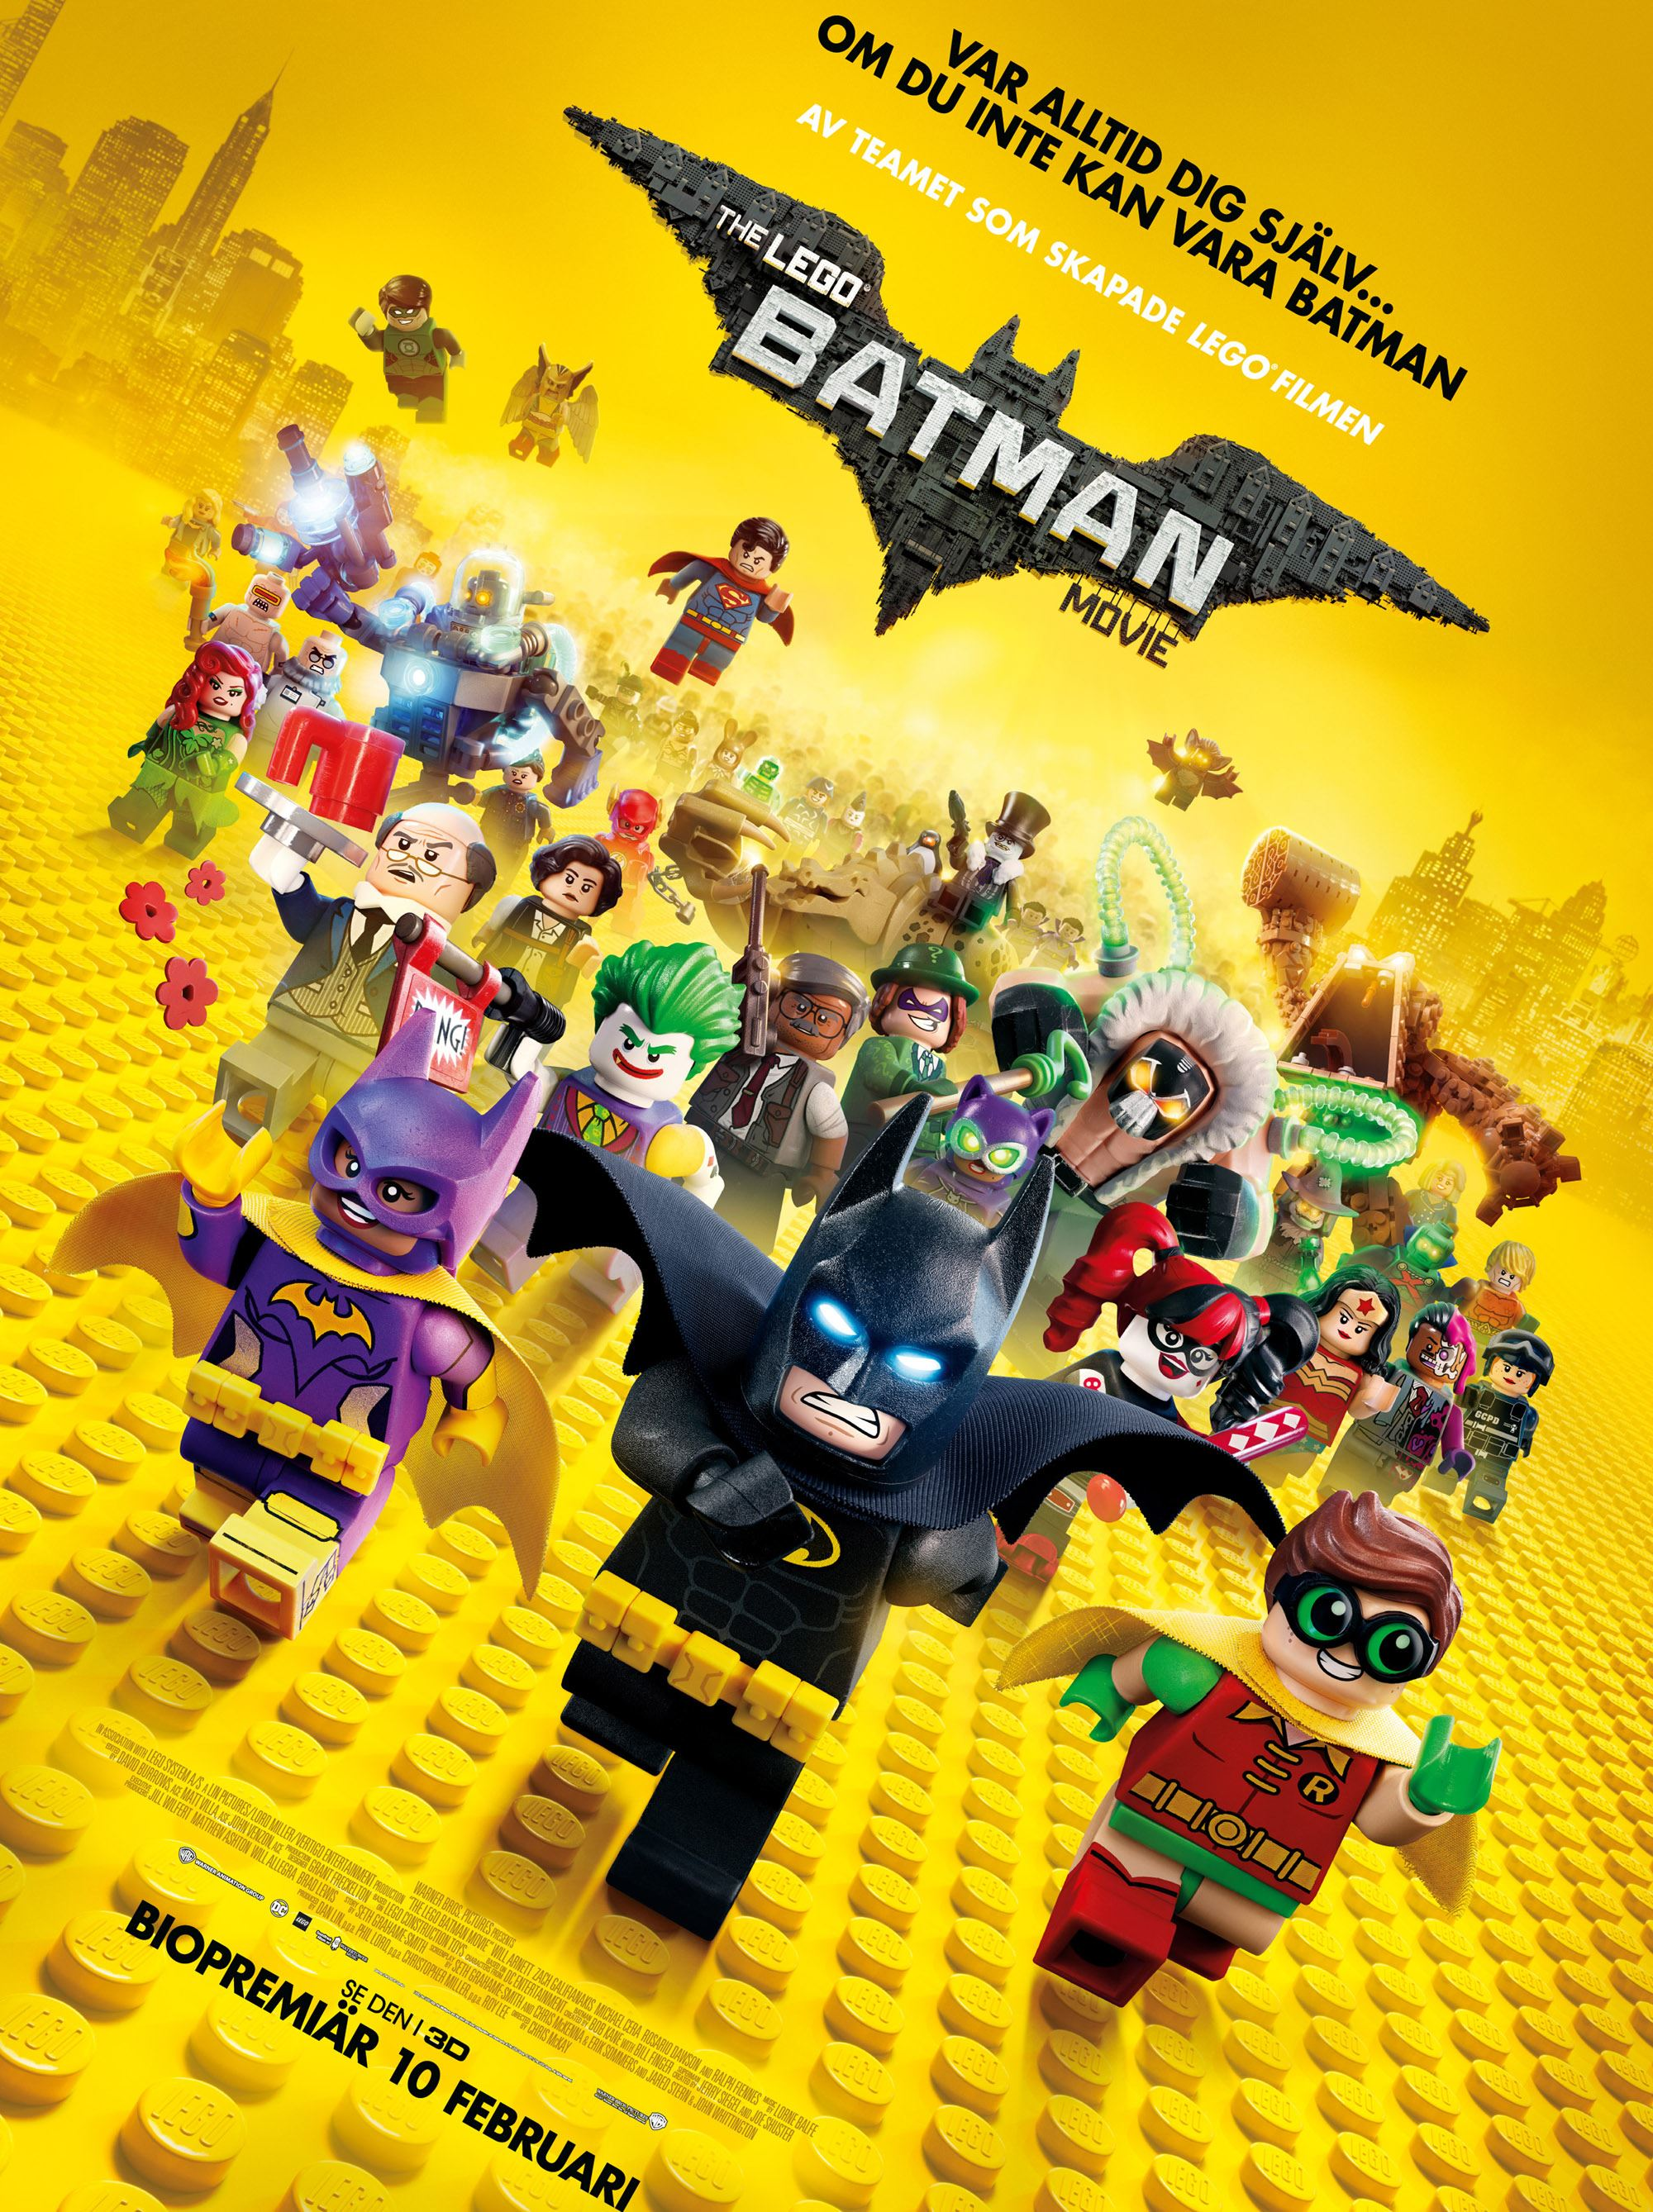 Sportlovsbio - THE LEGO BATMAN MOVIE